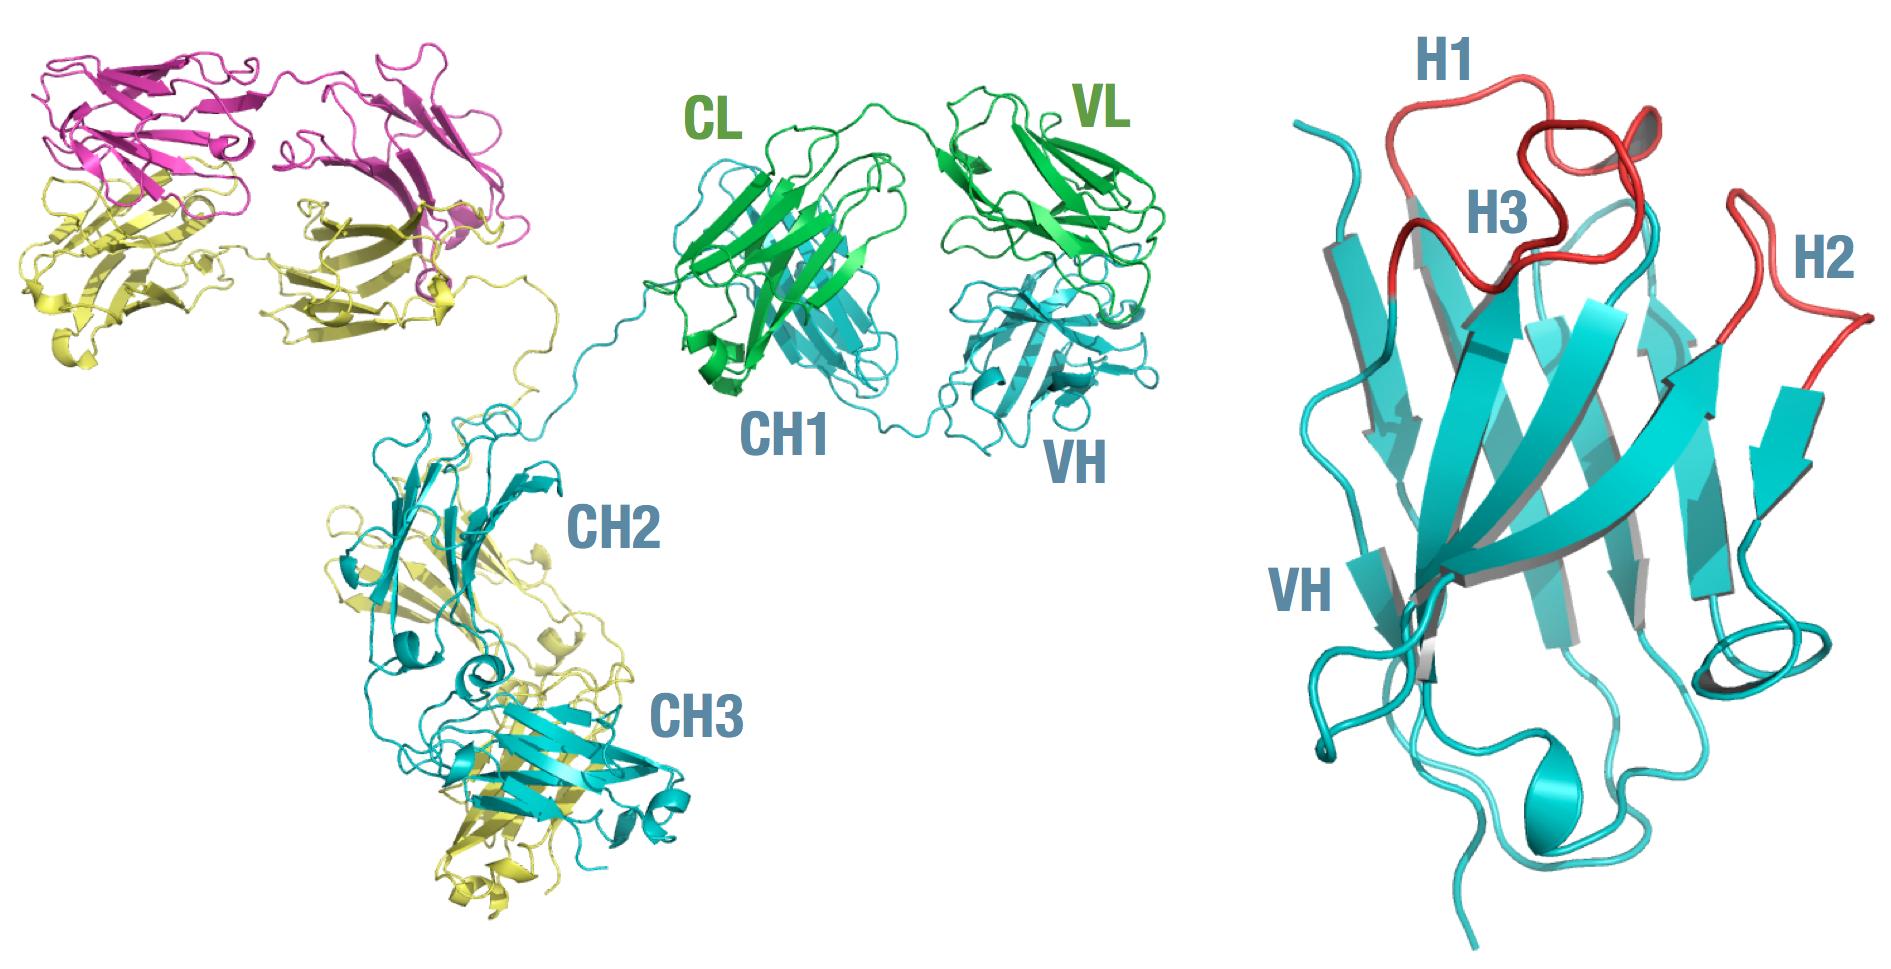 Immunoglobulin g igg structure